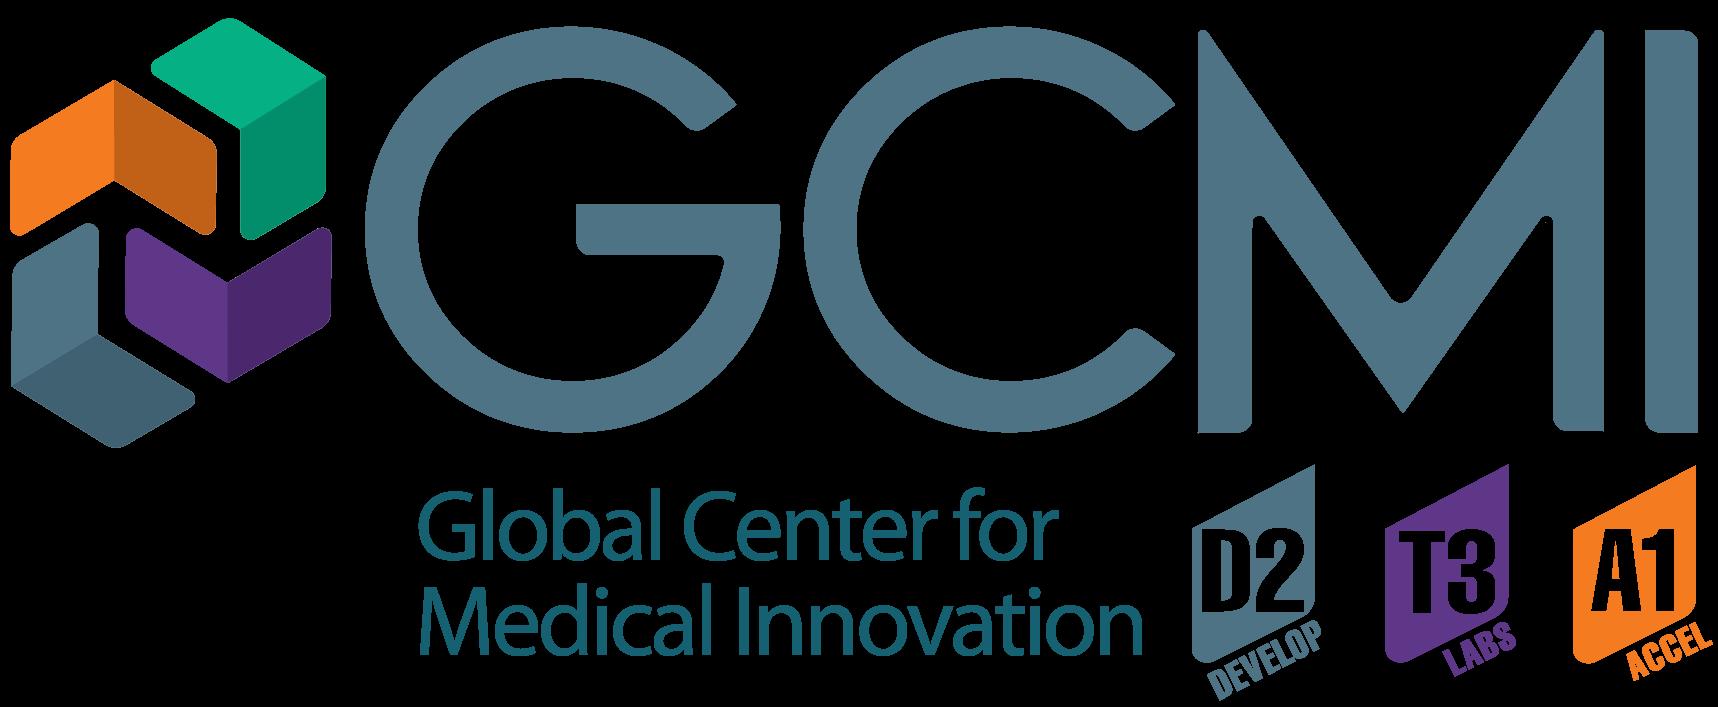 GCMI-logo-new-2